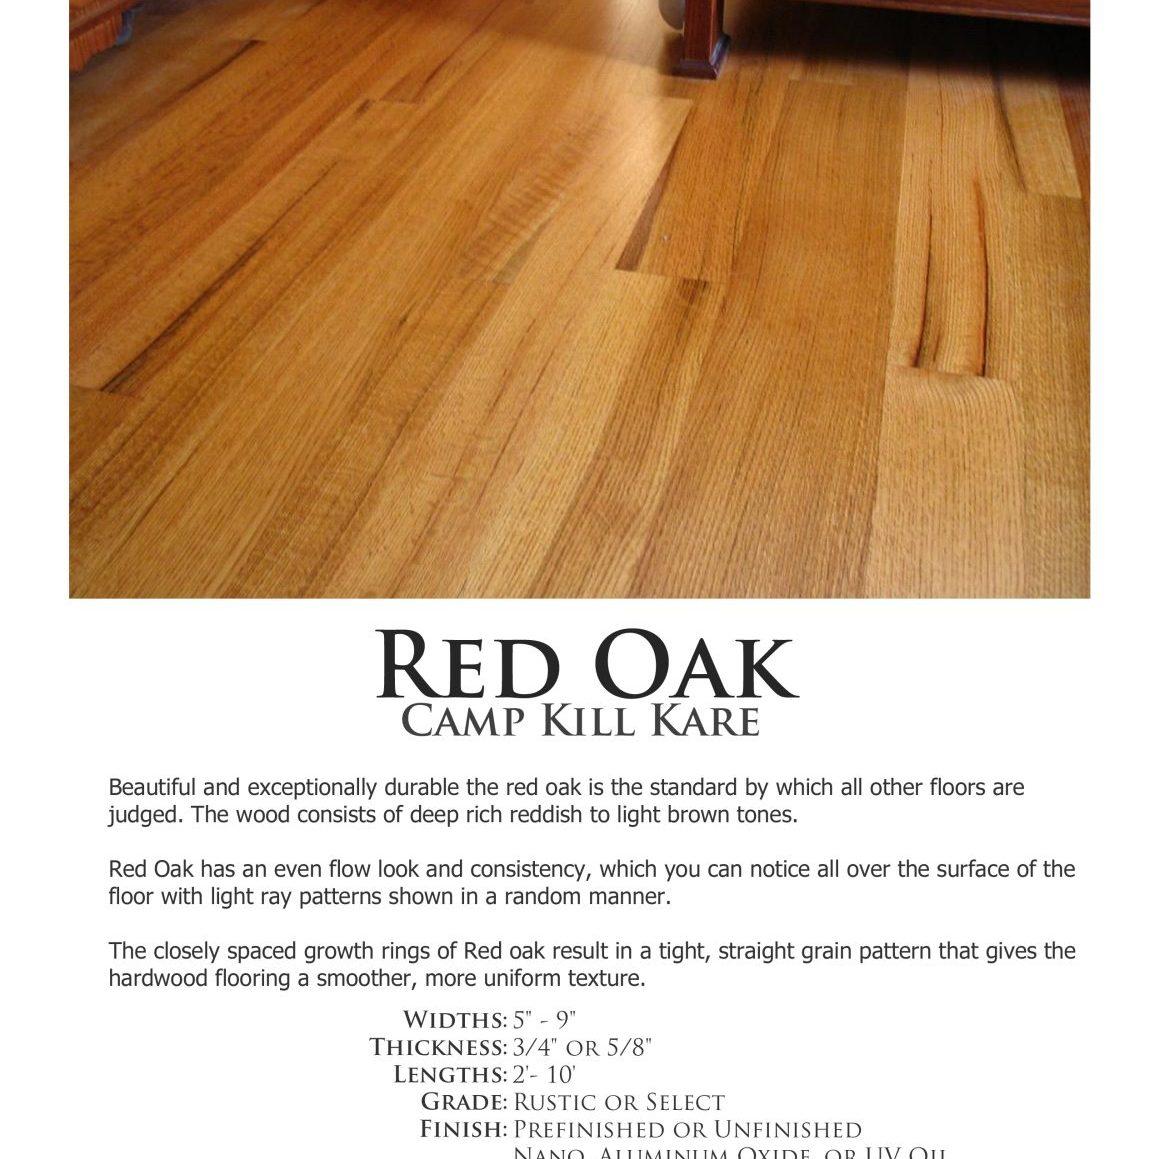 KillKare-Red Oak